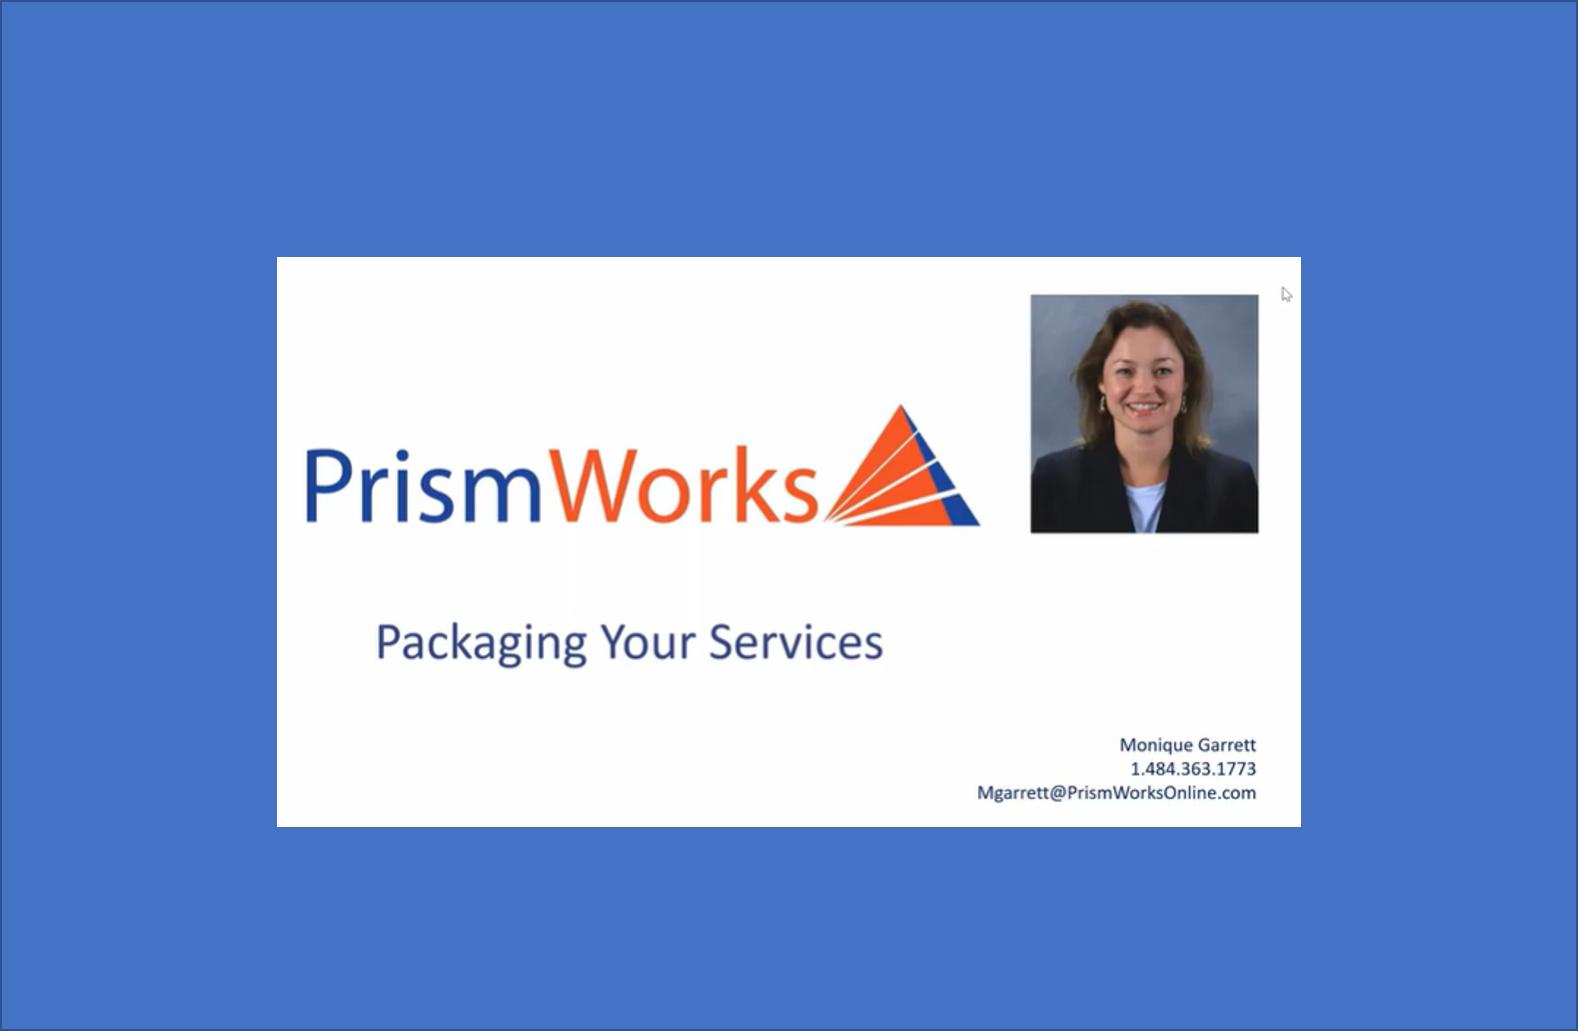 Monique Garrett, Prismworks Tells Us About